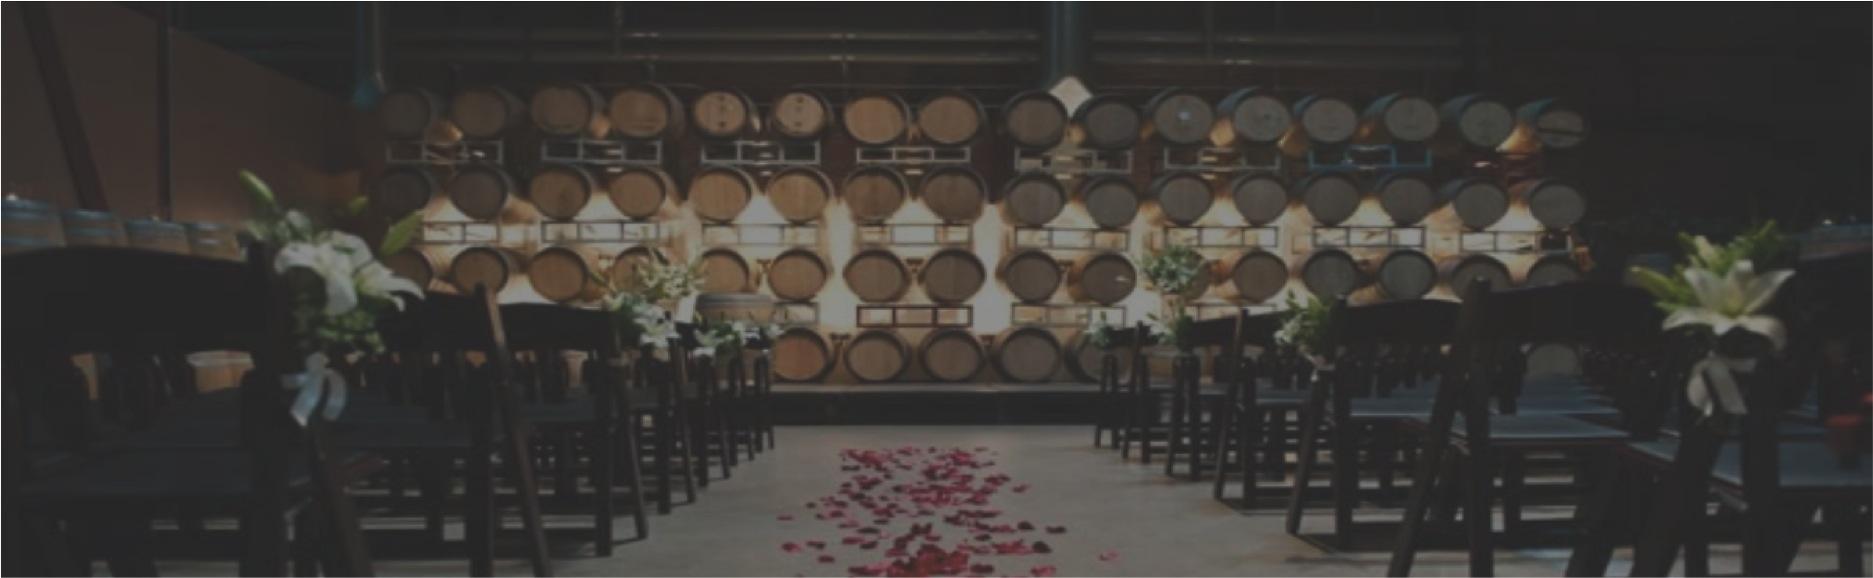 Wedding Spot Top Northern California Wedding Venues For 2015